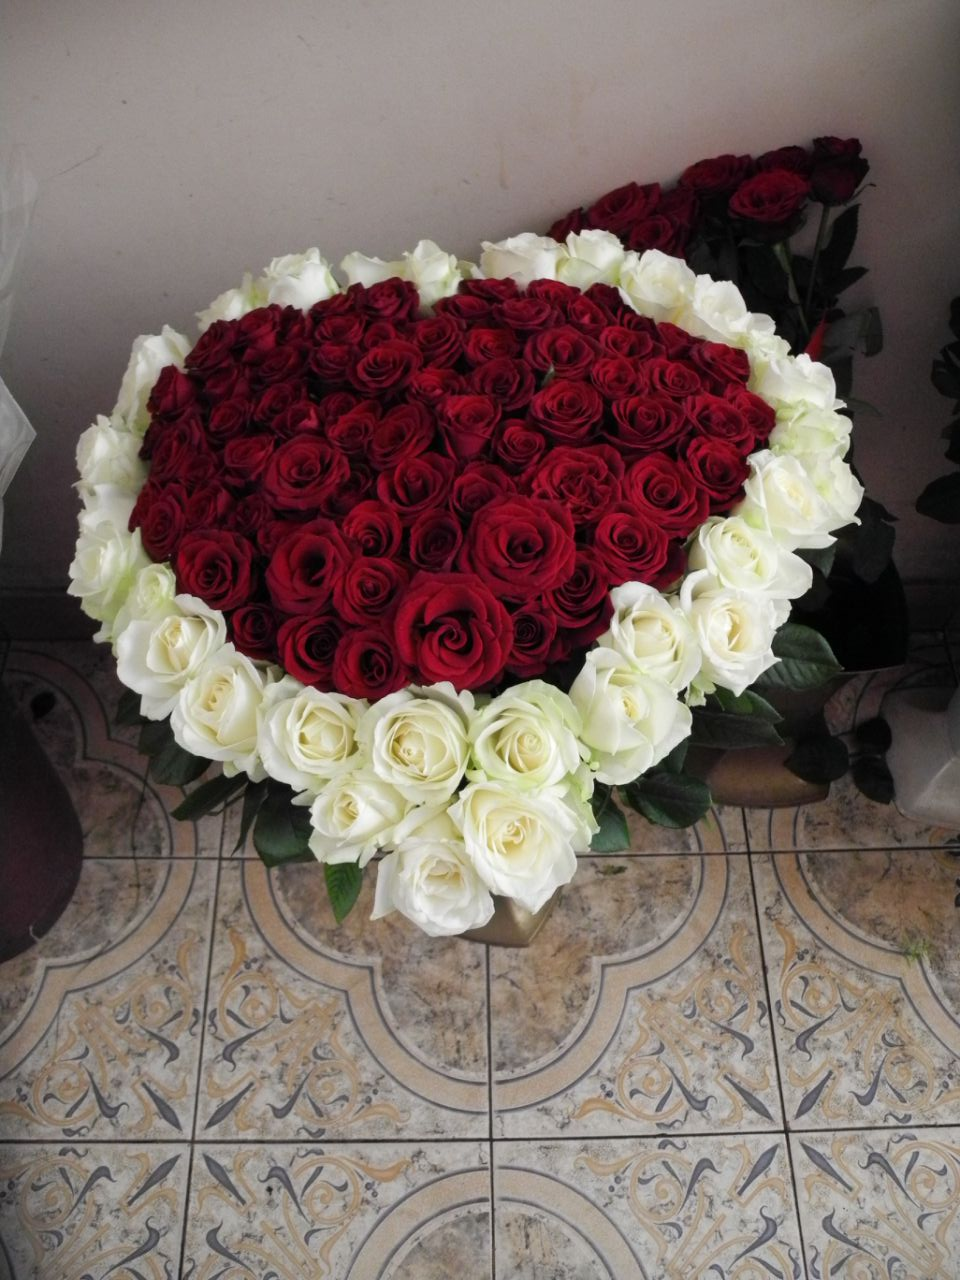 Фото товара Сердце (101 роза) в Ужгороде